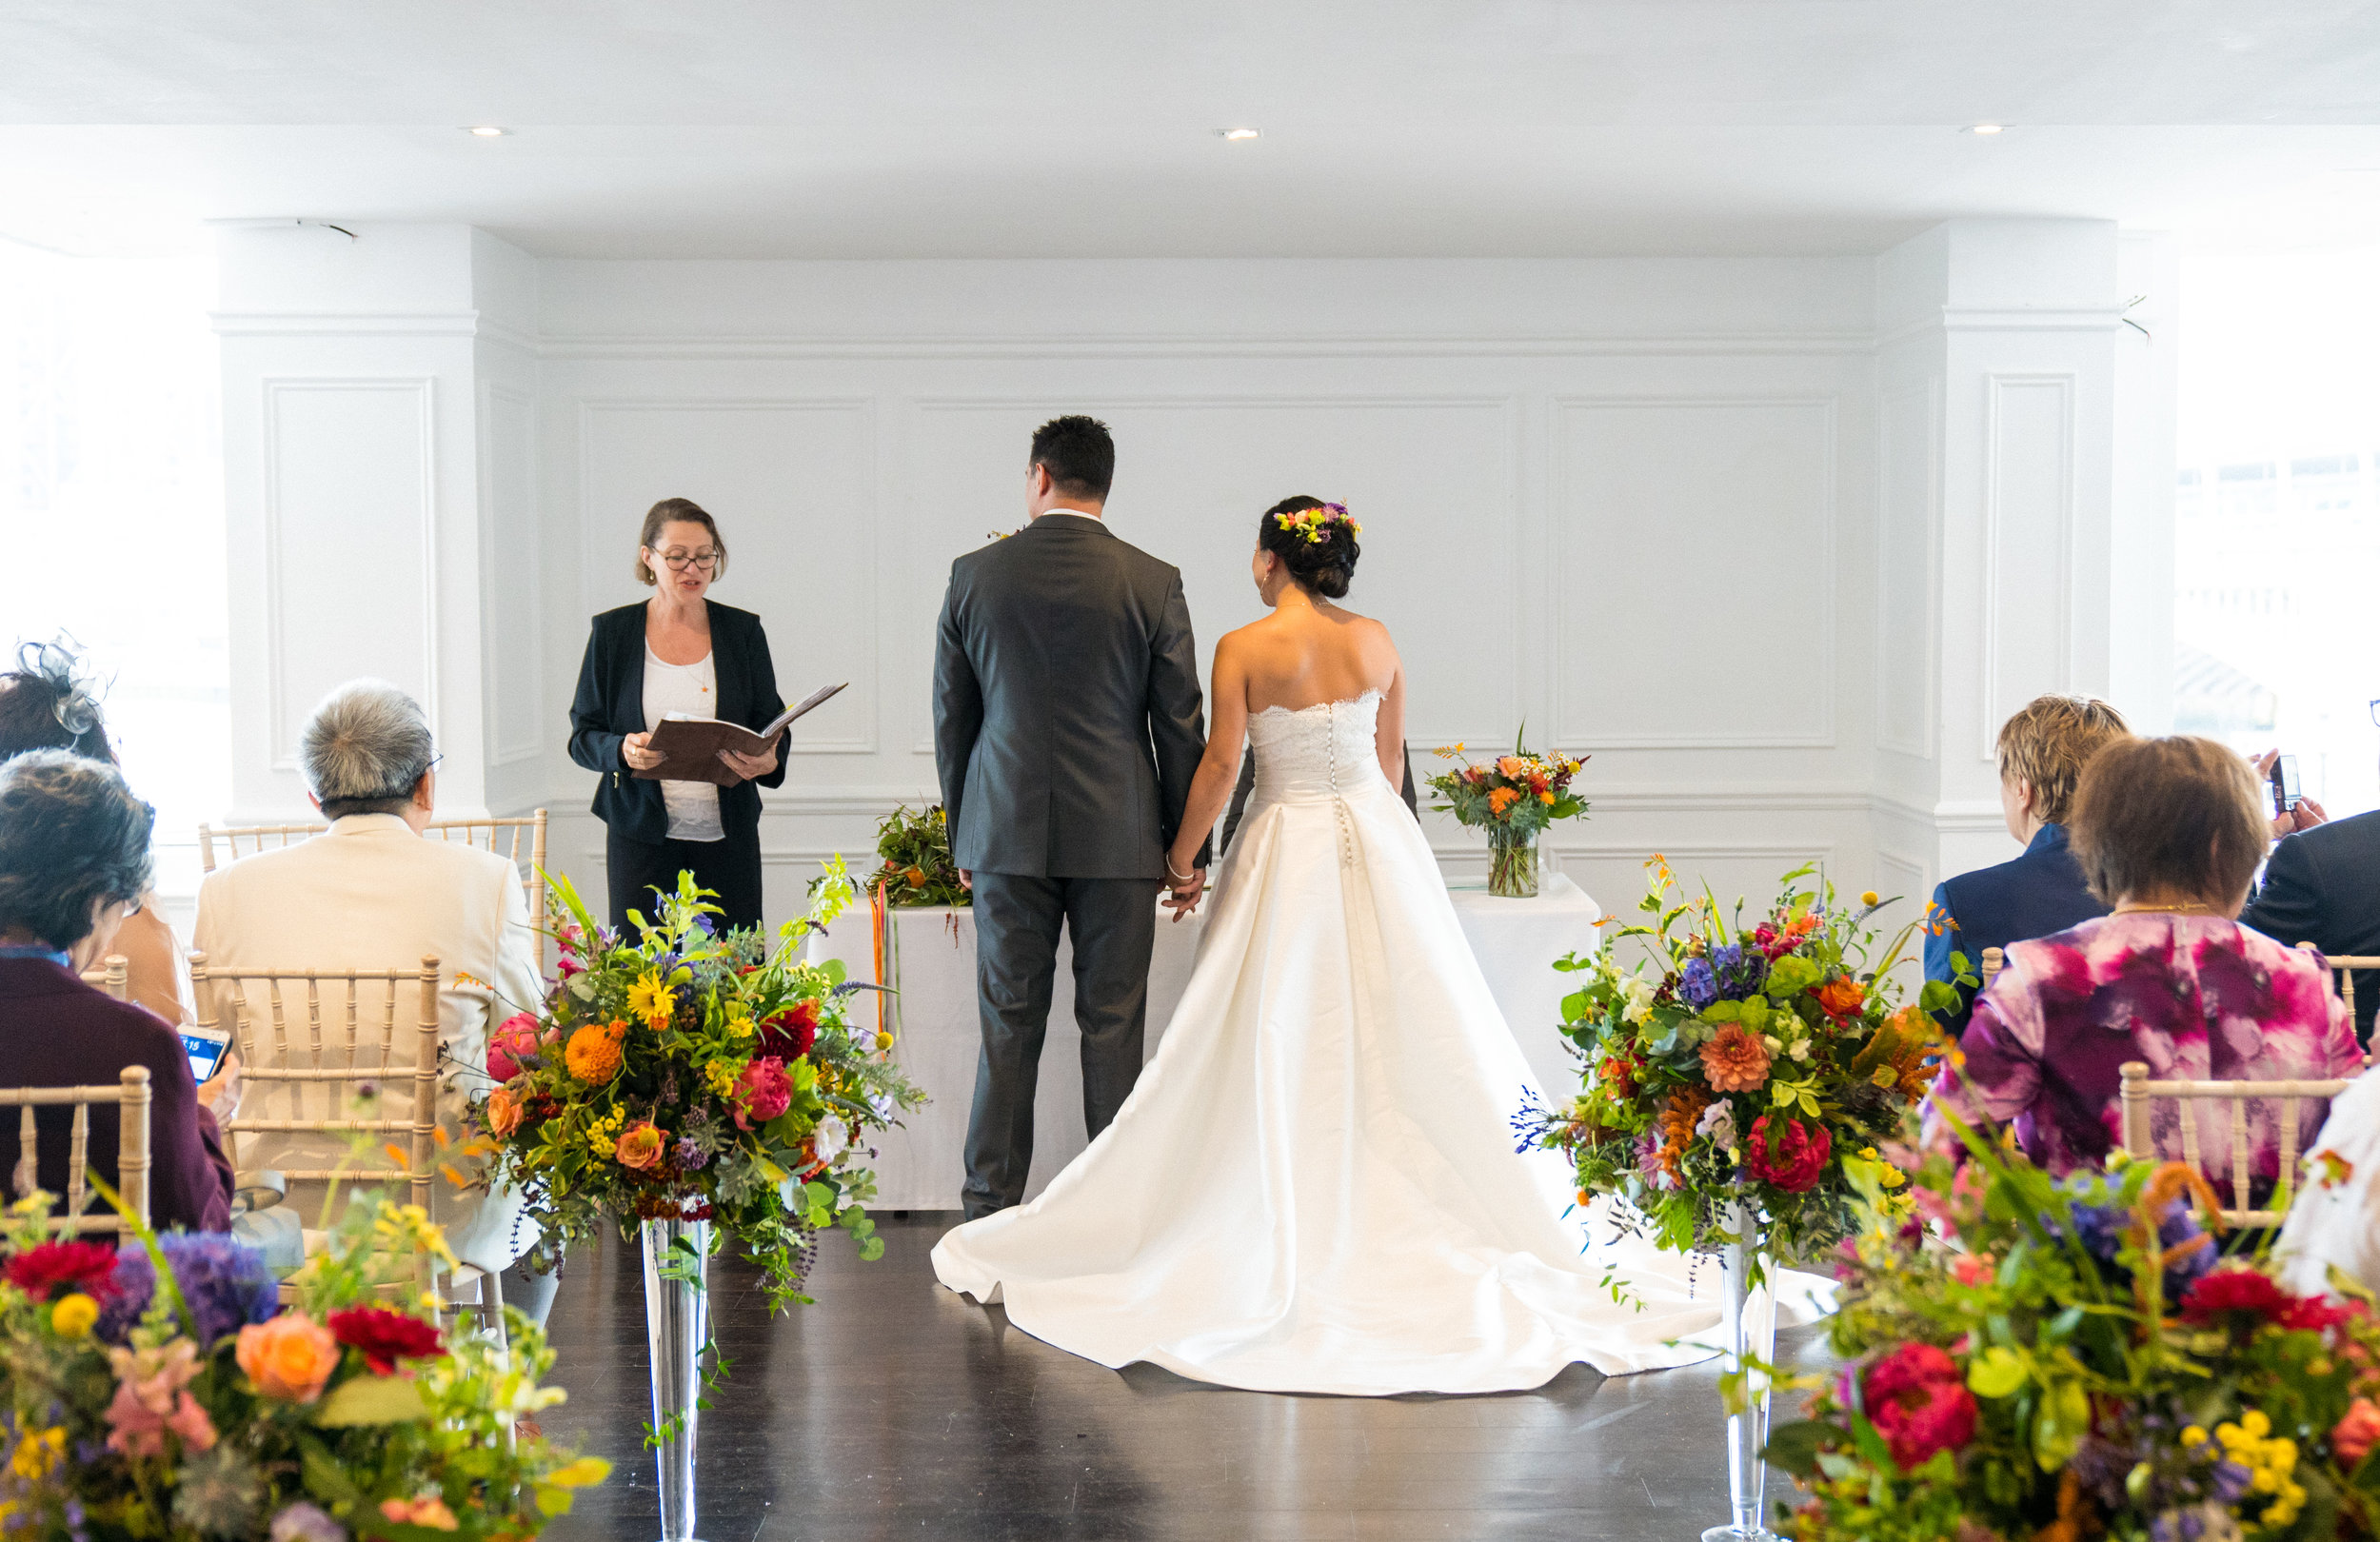 river-rooms-blackfriars-london-stpauls-mondrian-hotel-wedding-photography-videography-31